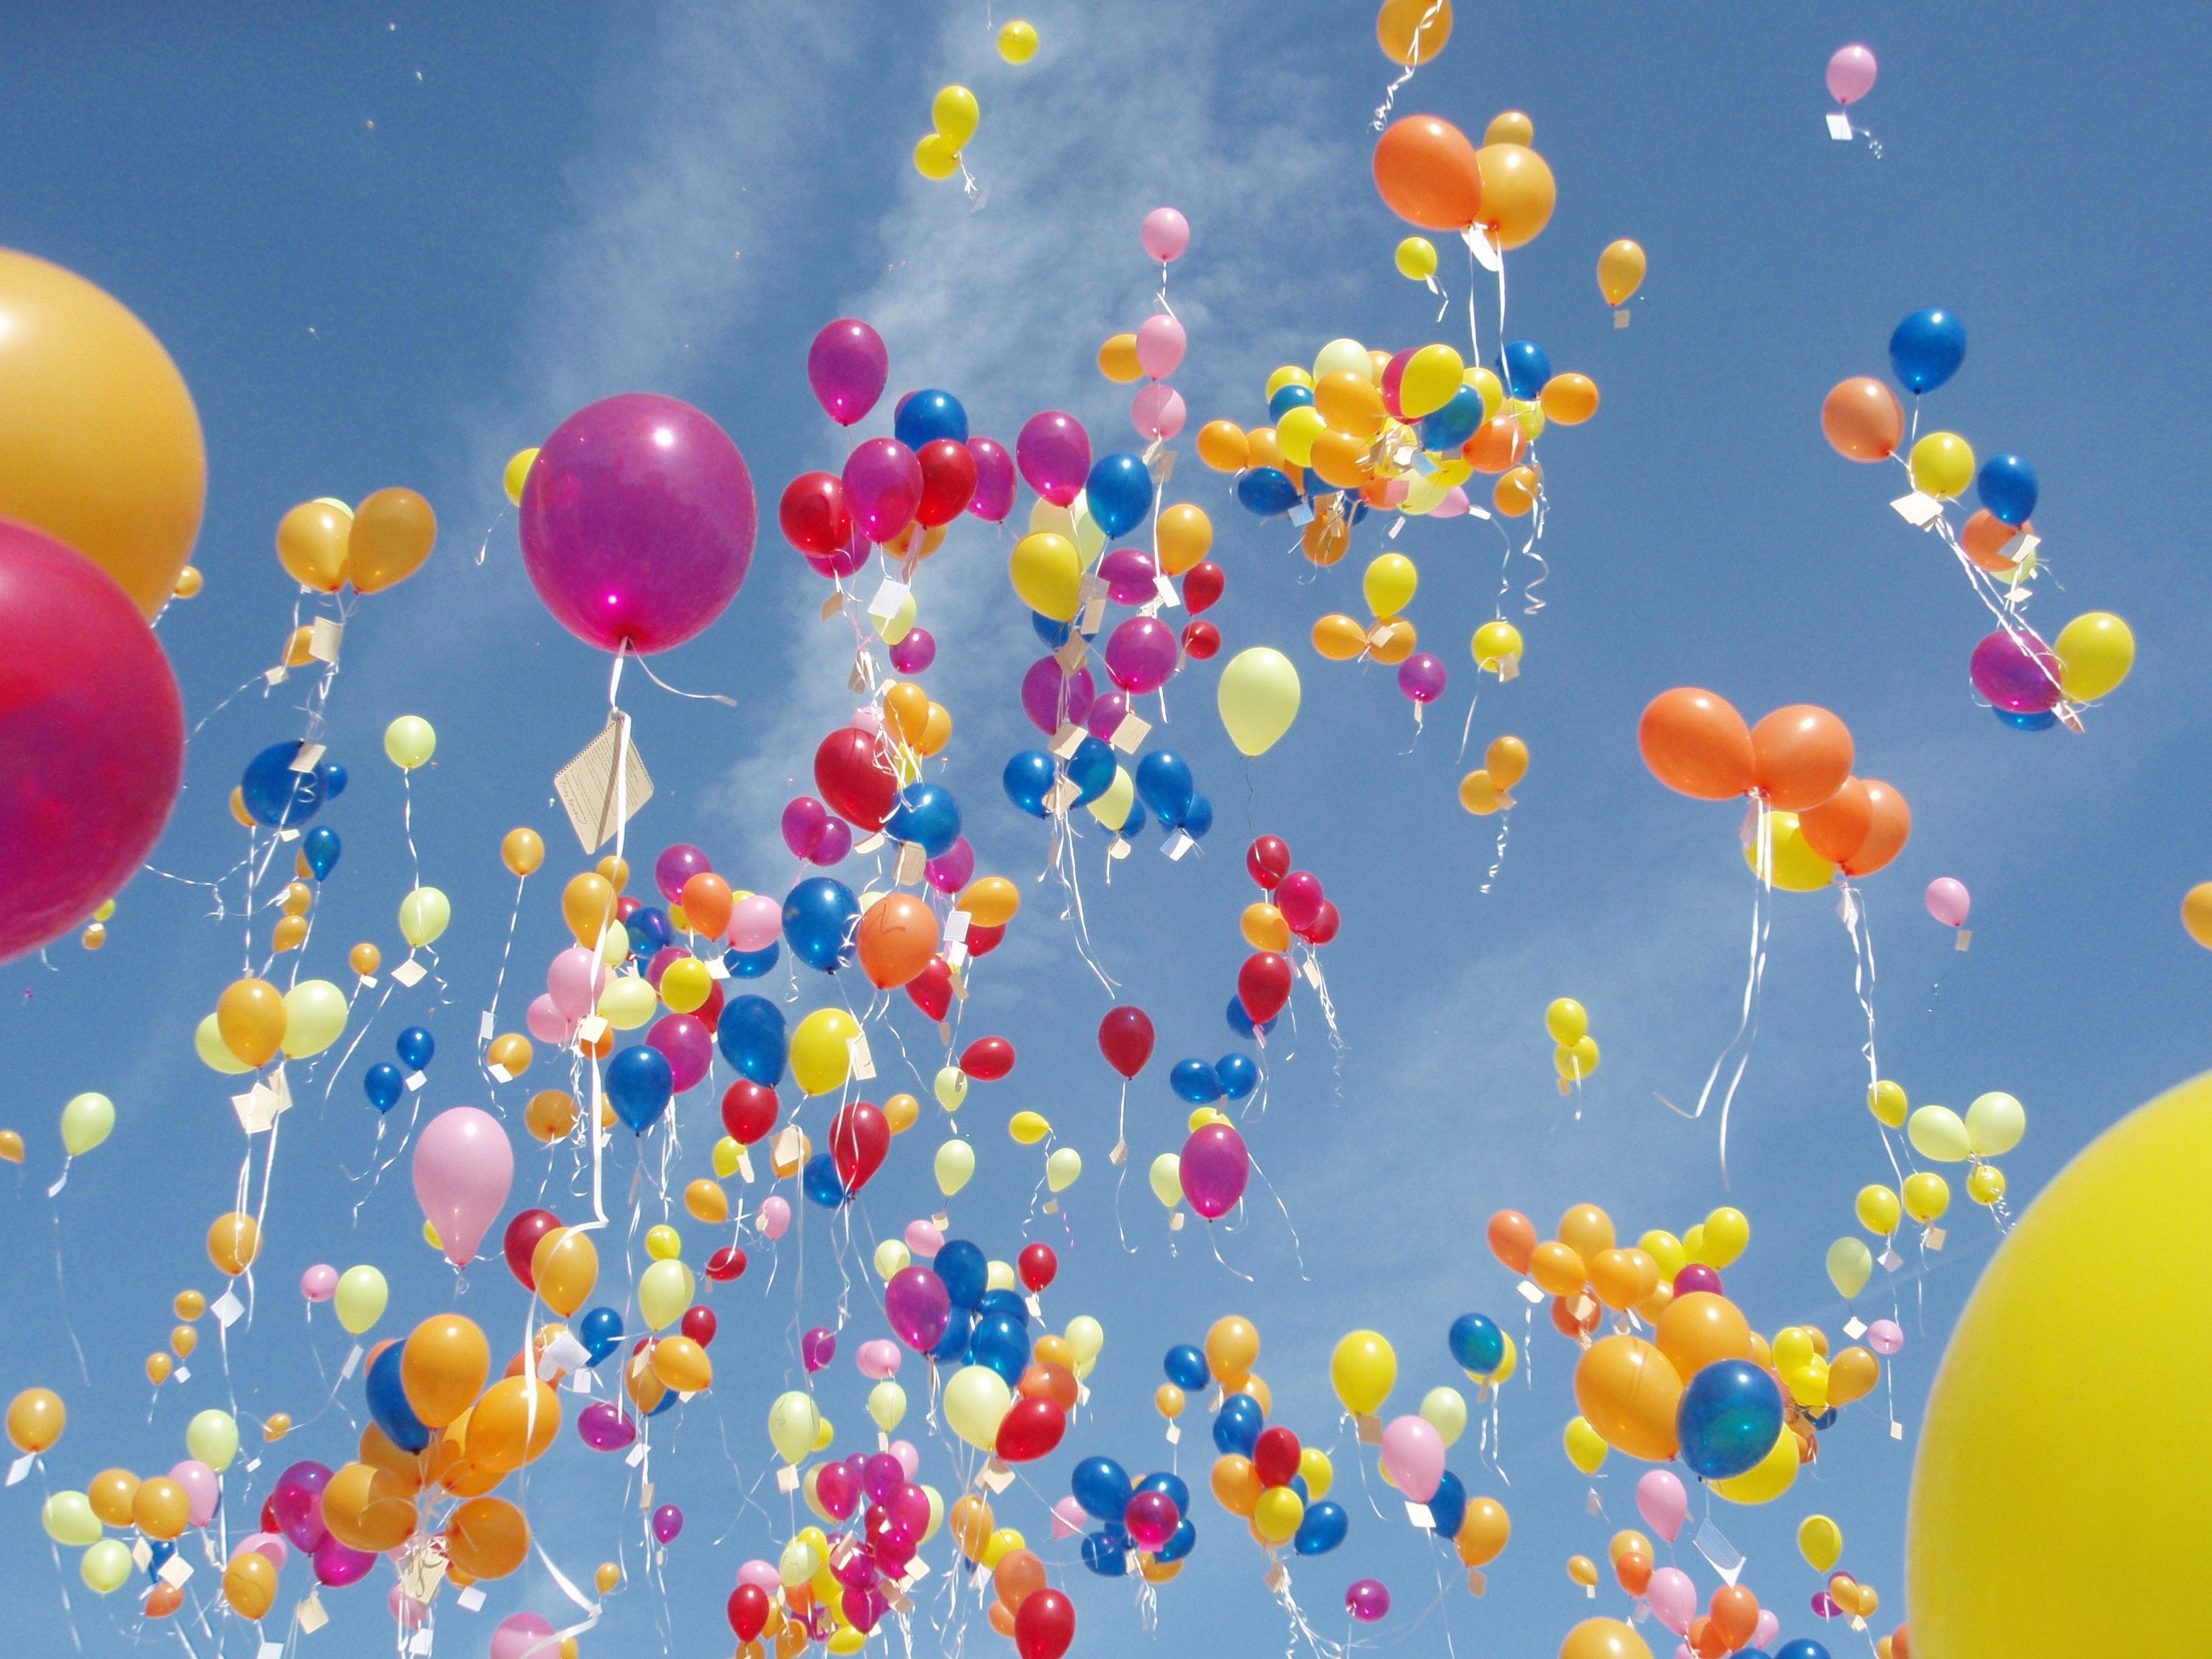 Happy Birthday Flowers And Balloons ~ Balloons by cajun497 on deviantart happy birthday pinterest